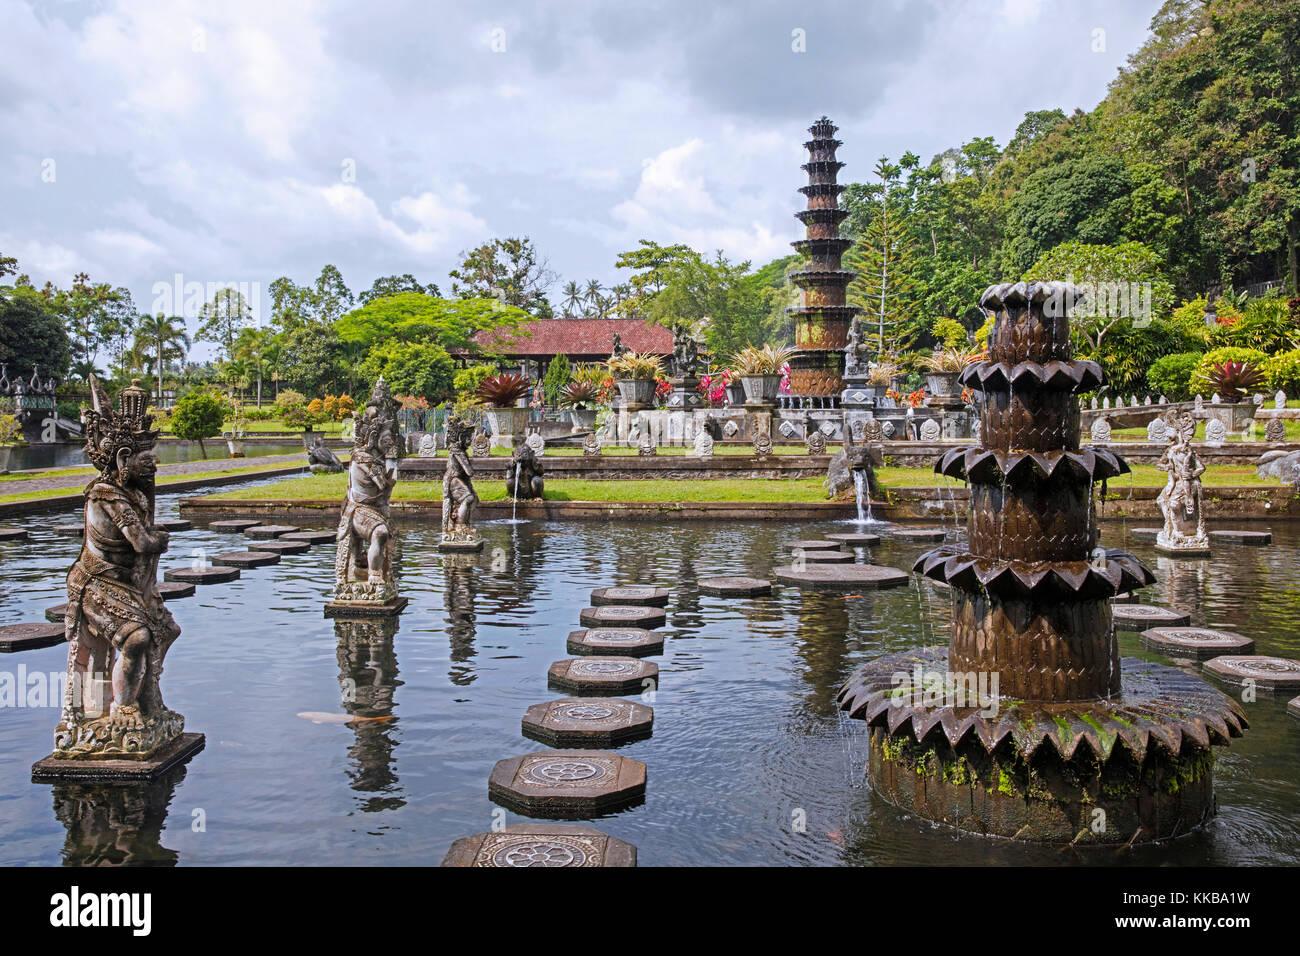 Stagni e fontane a tirta gangga, ex acqua Royal Palace a ababi, karangasem vicino abang in Bali Orientale, Indonesia Foto Stock